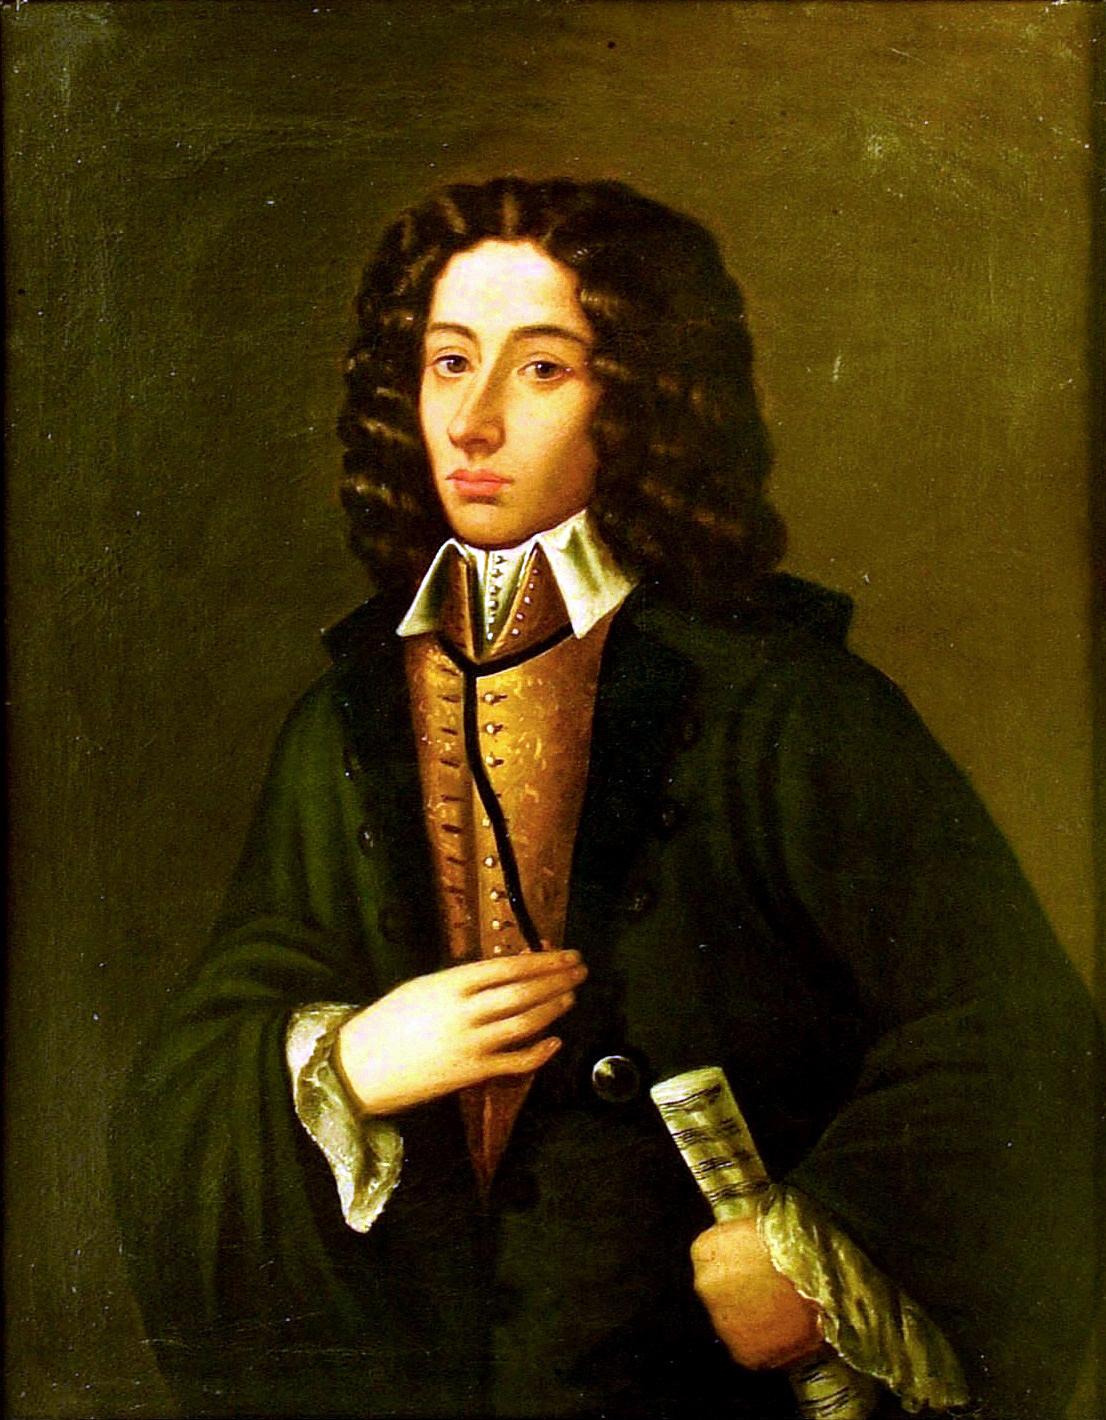 Giovanni Battista Pergolesi Wikipedia